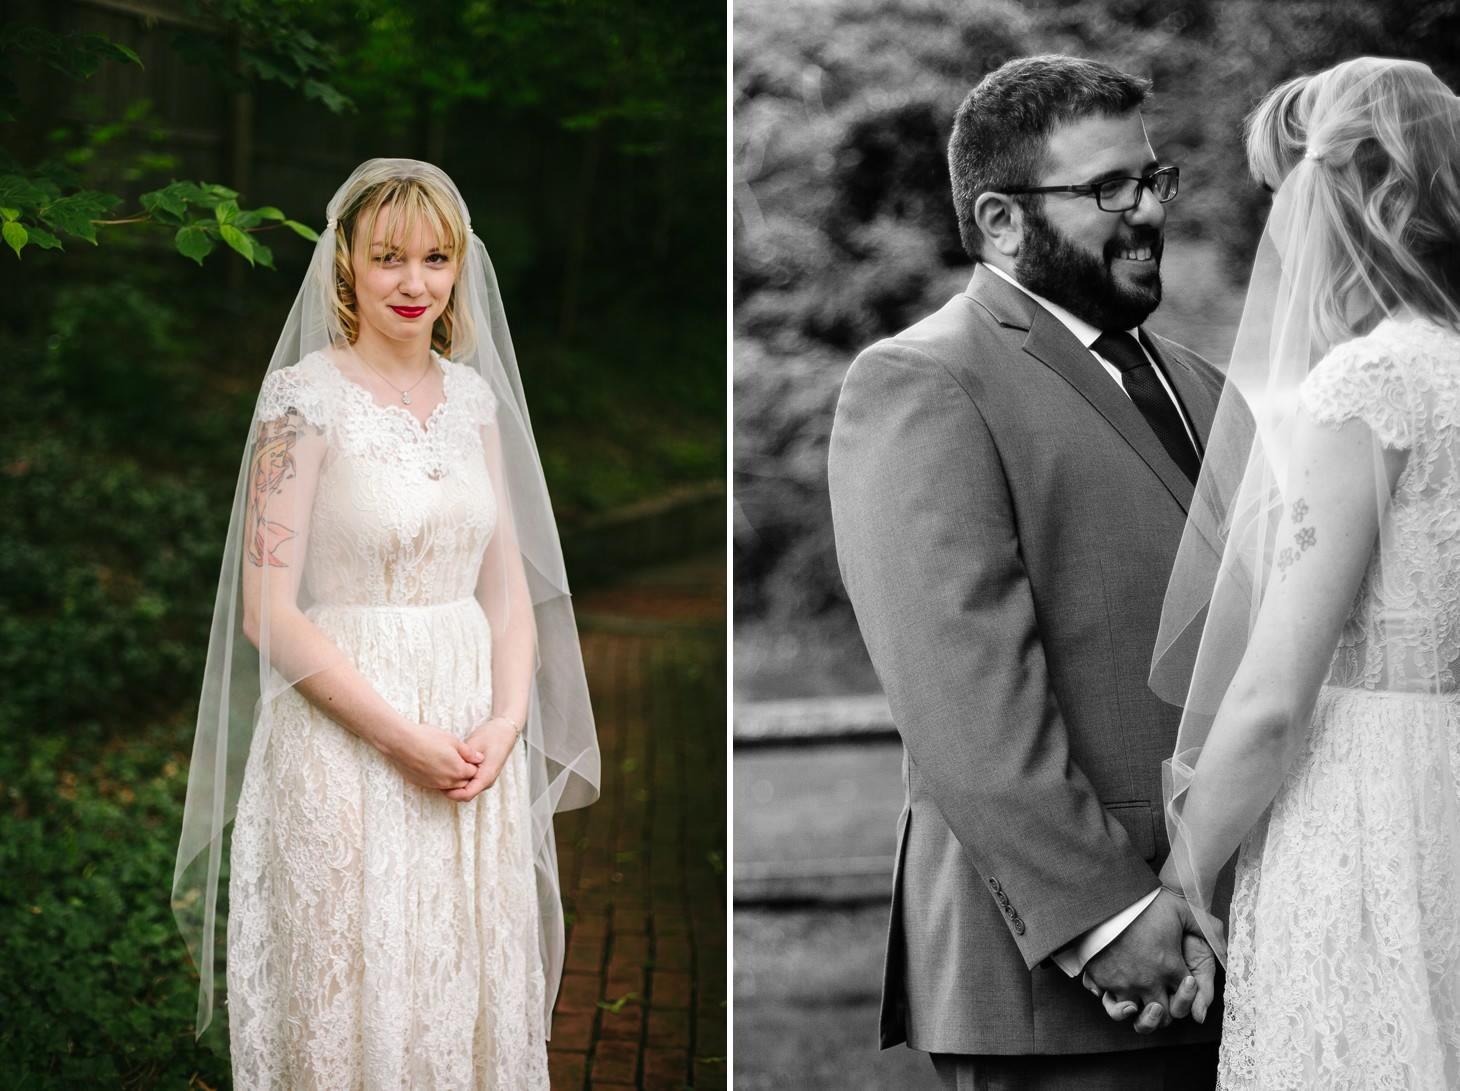 nyc-wedding-photographer-brooklyn-bridge-smitten-chickens-rainy-emotional-wedding-002.jpg